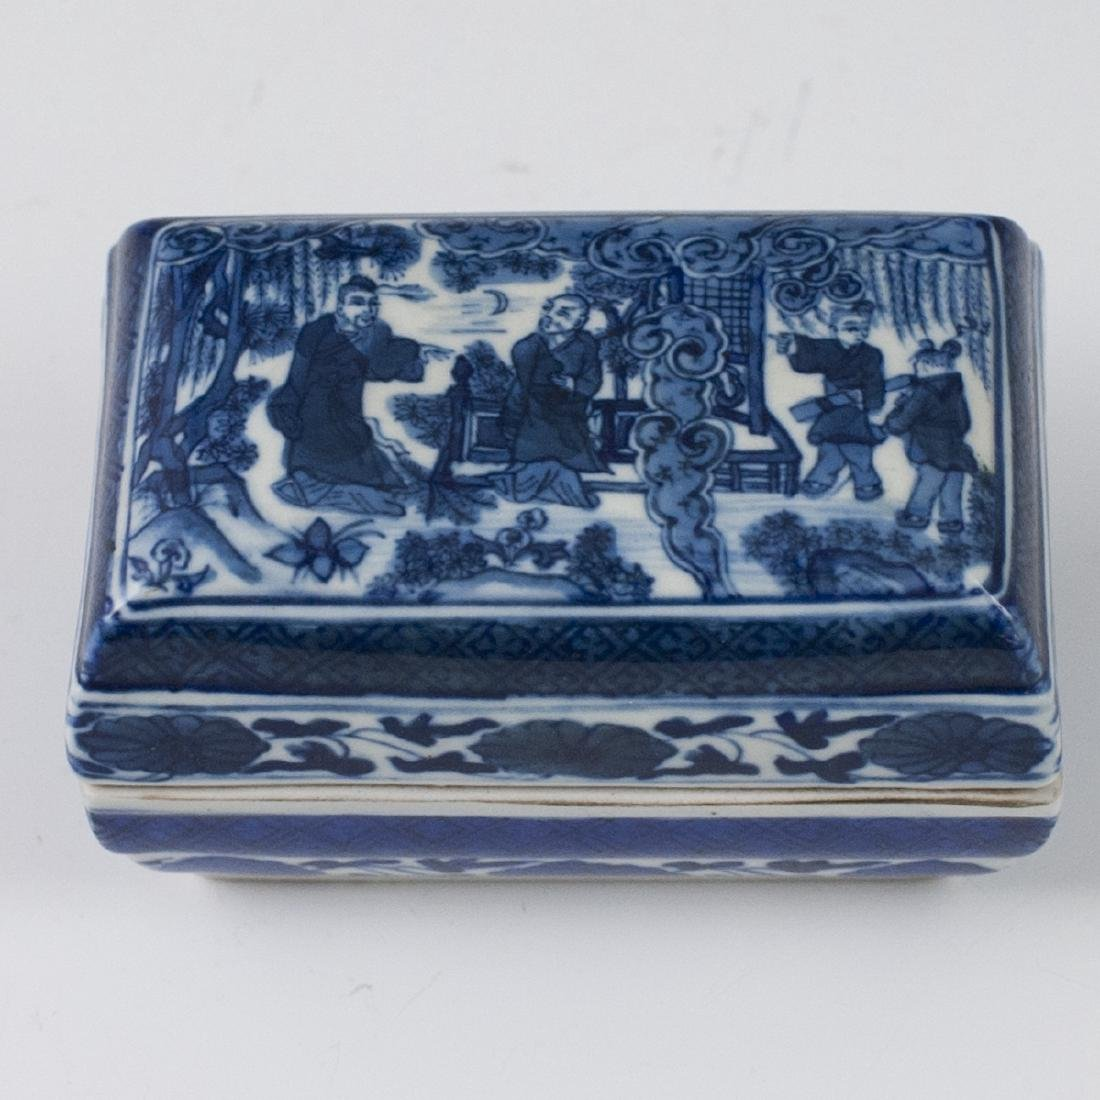 Antique Chinese Porcelain Box - 2